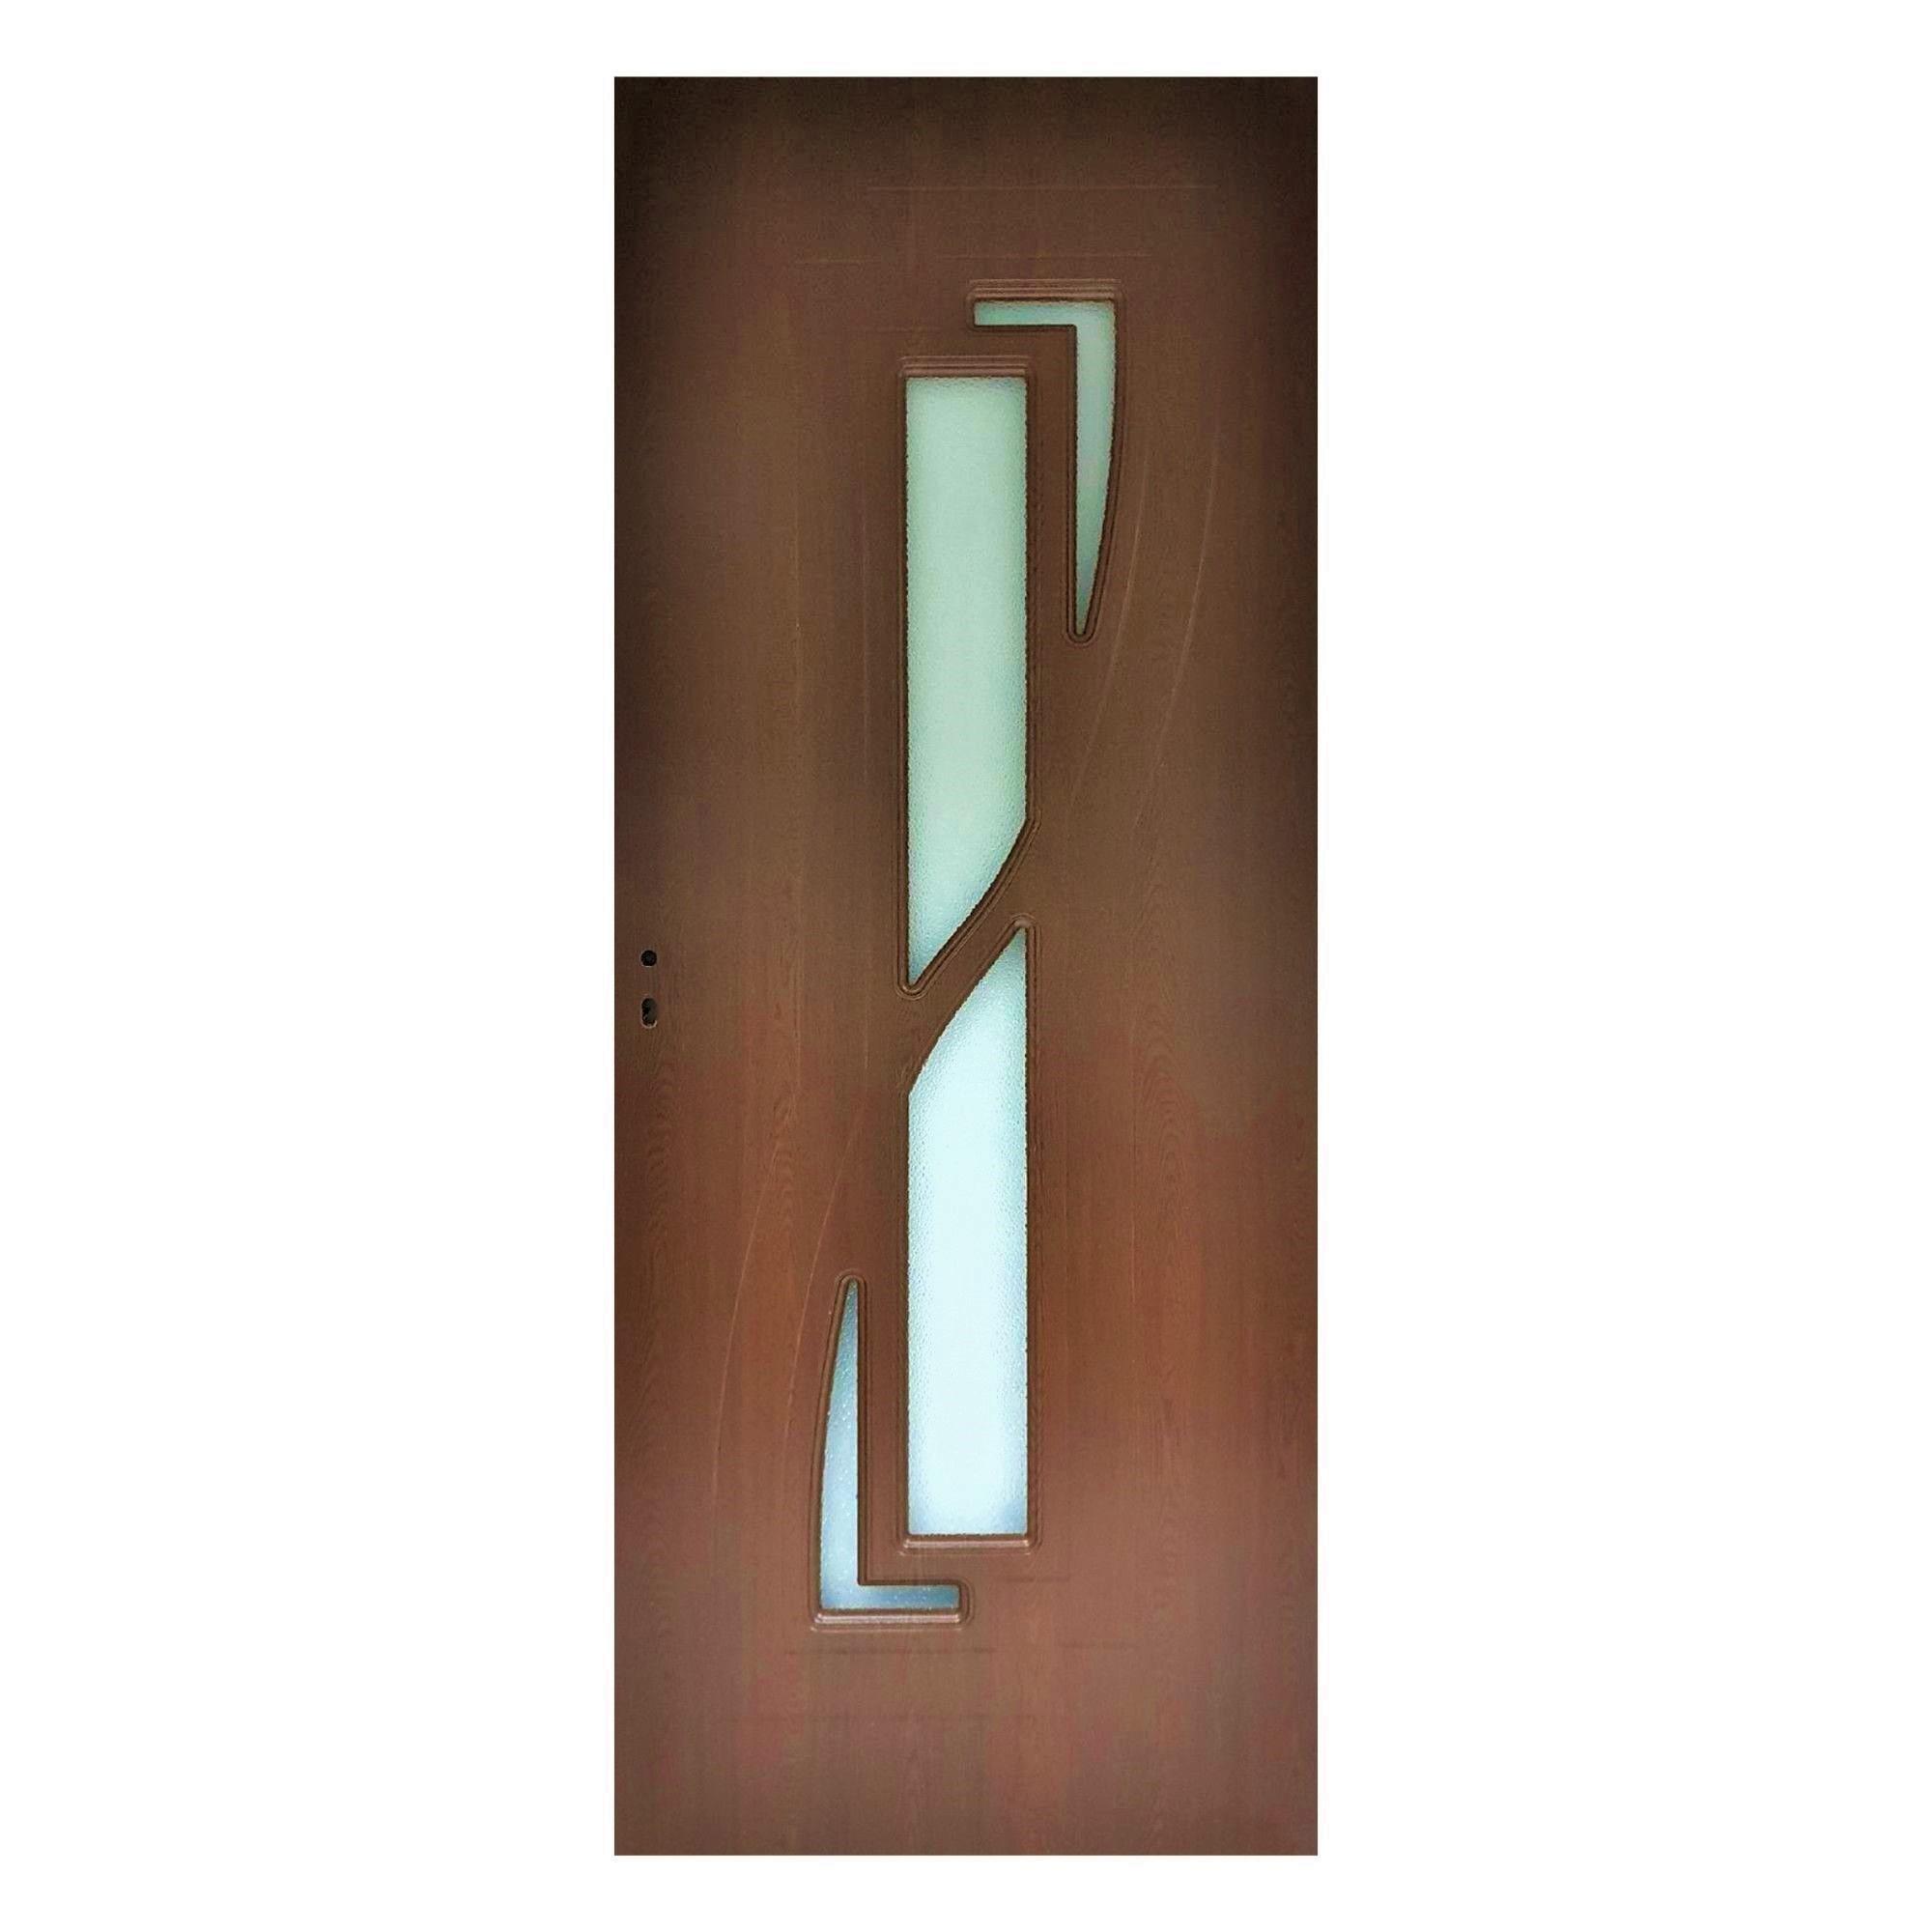 Usa interior cu geam Pamate M042, stejar auriu, 203 x 60 x 3,5 cm + toc reglabil, reversibila